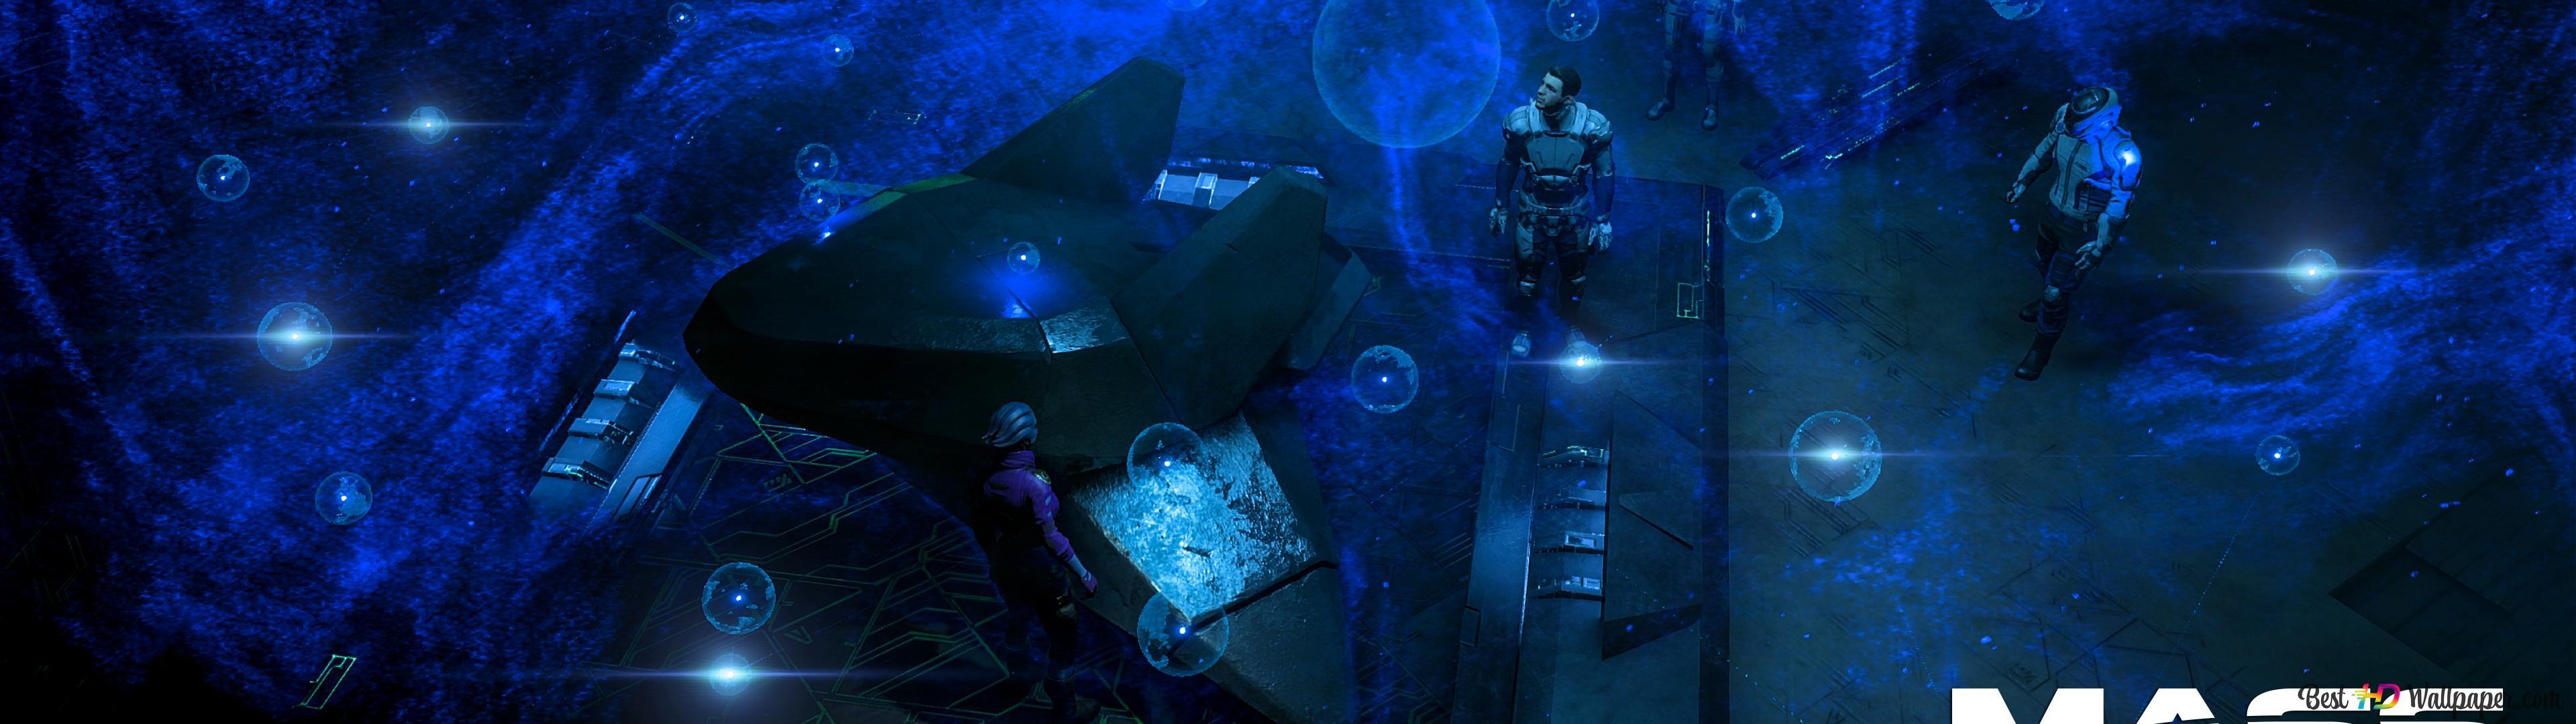 Mass Effect Andromeda Hd Wallpaper Download